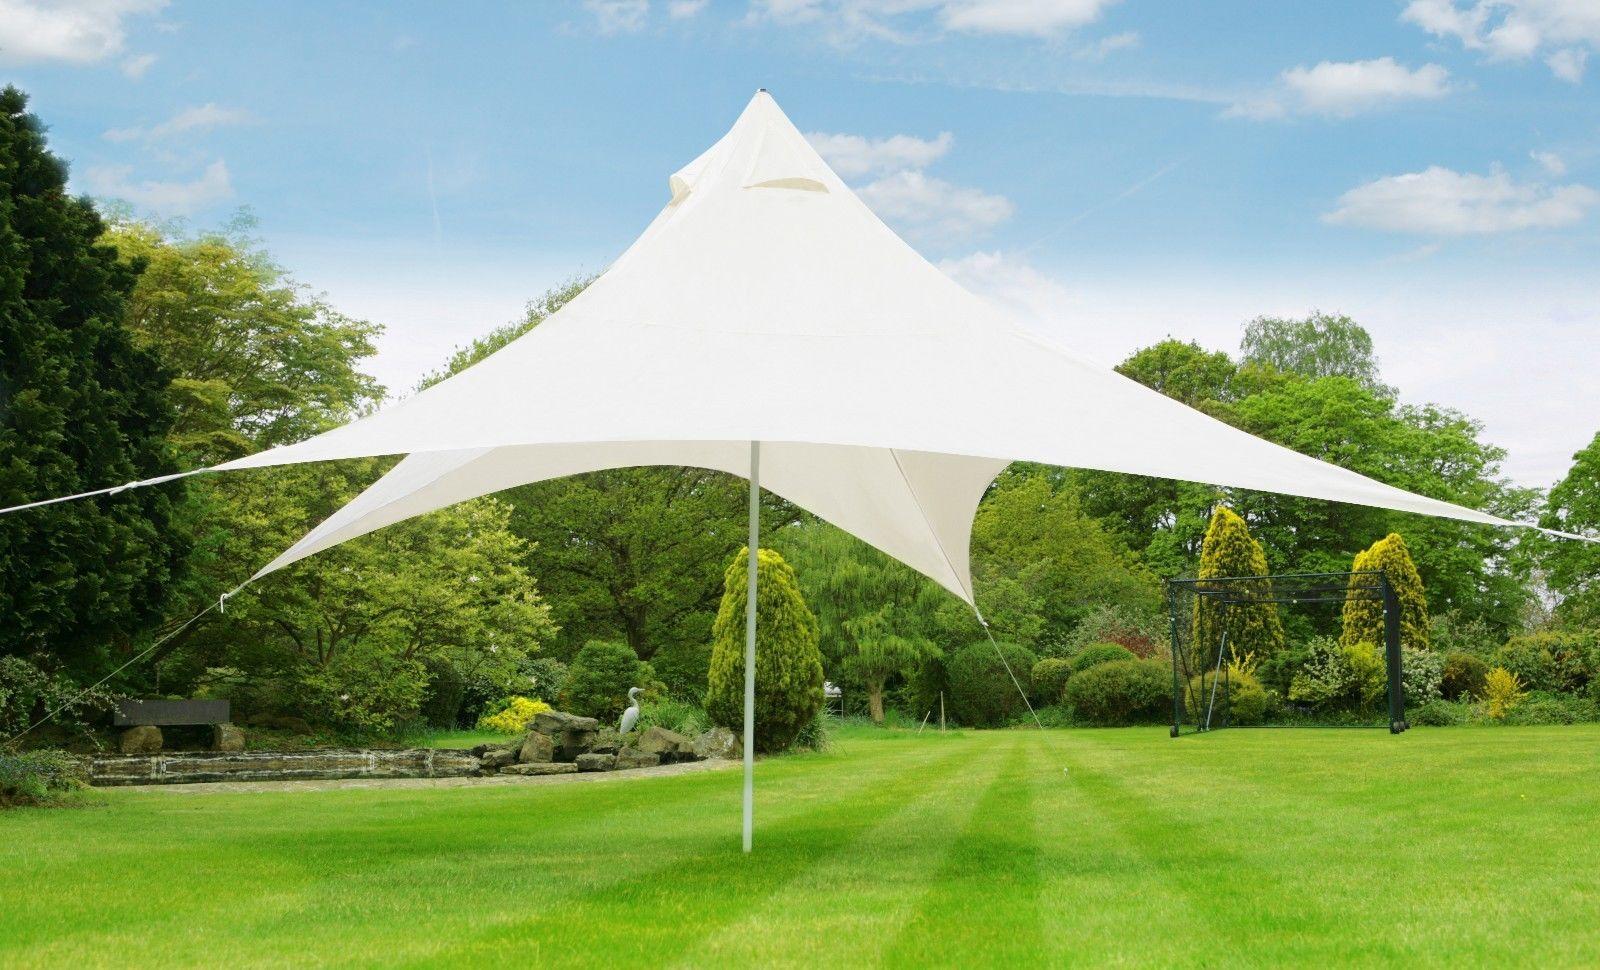 4 5m Pyramid Ivory Sun Shade Sail Kit With Pole Ropes Pegs Garden